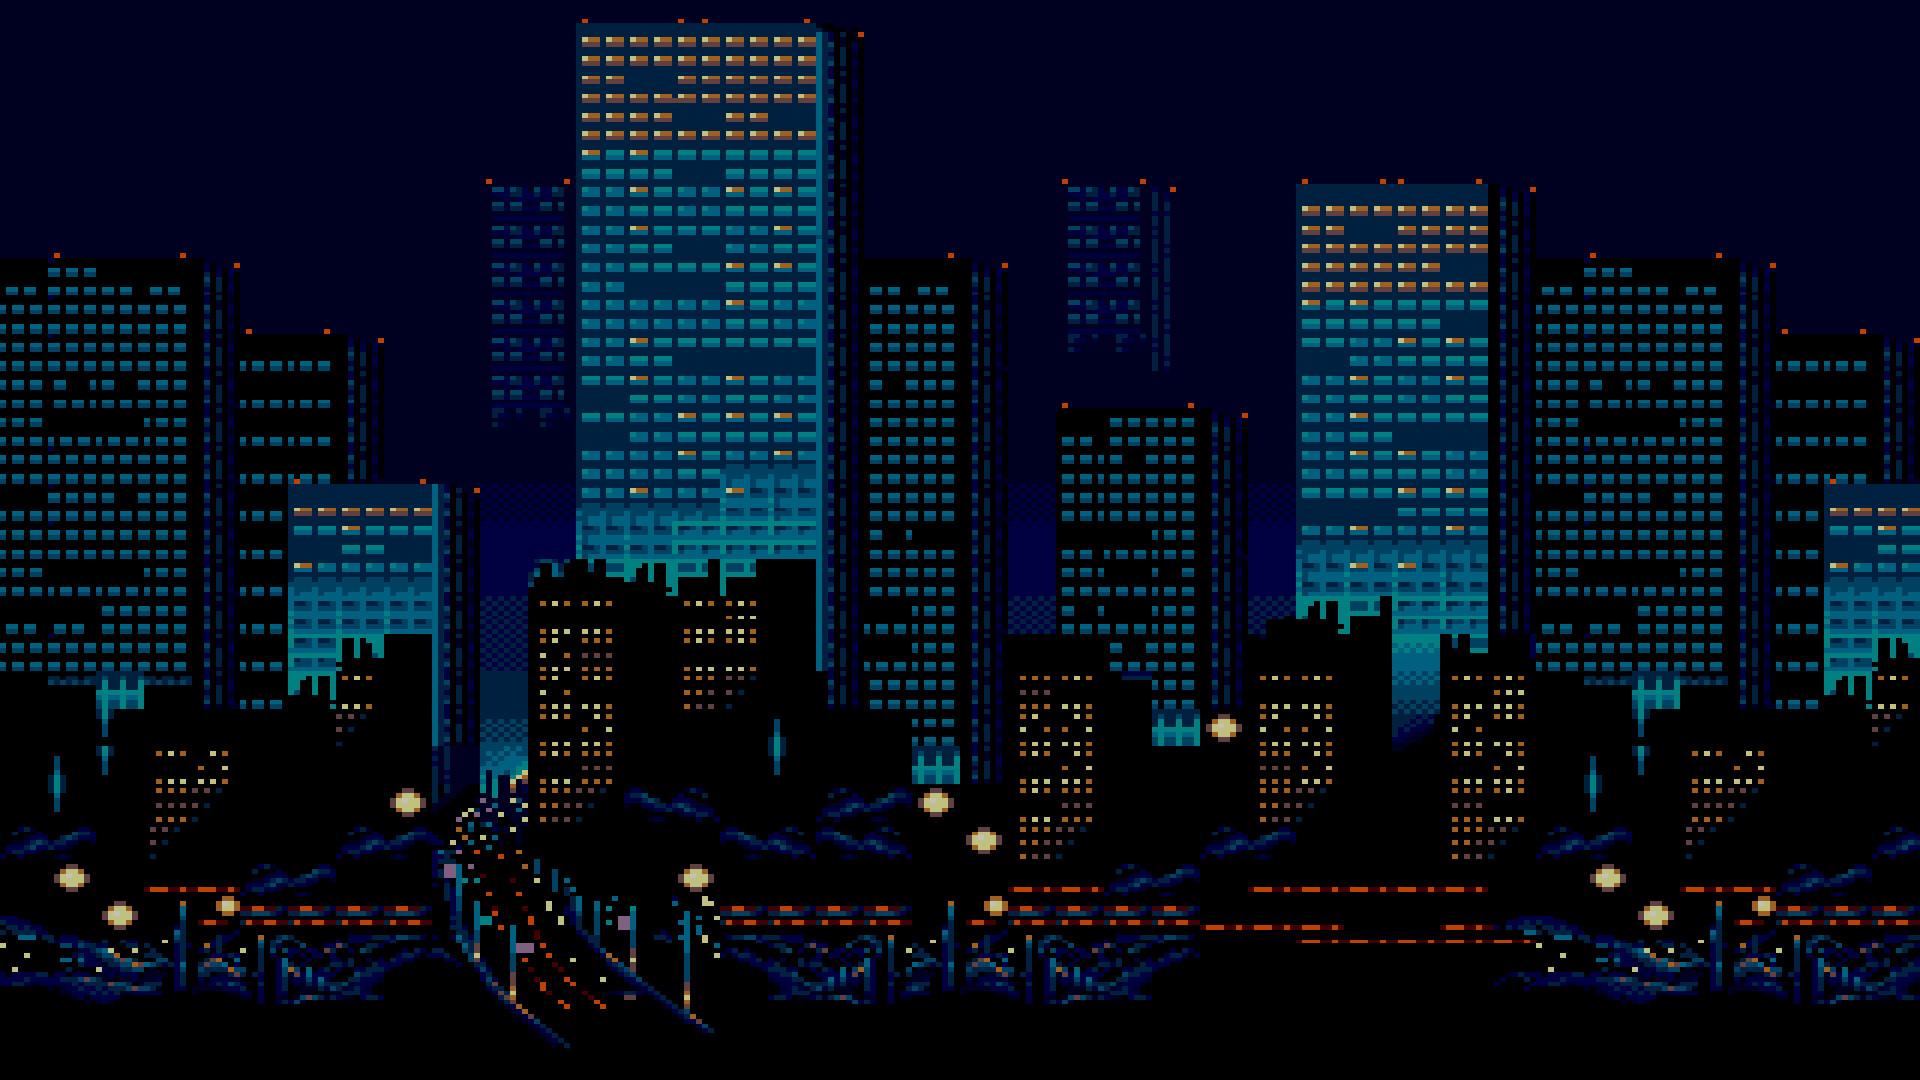 Mega Man Iphone Wallpaper 16 Bit Wallpaper 77 Images